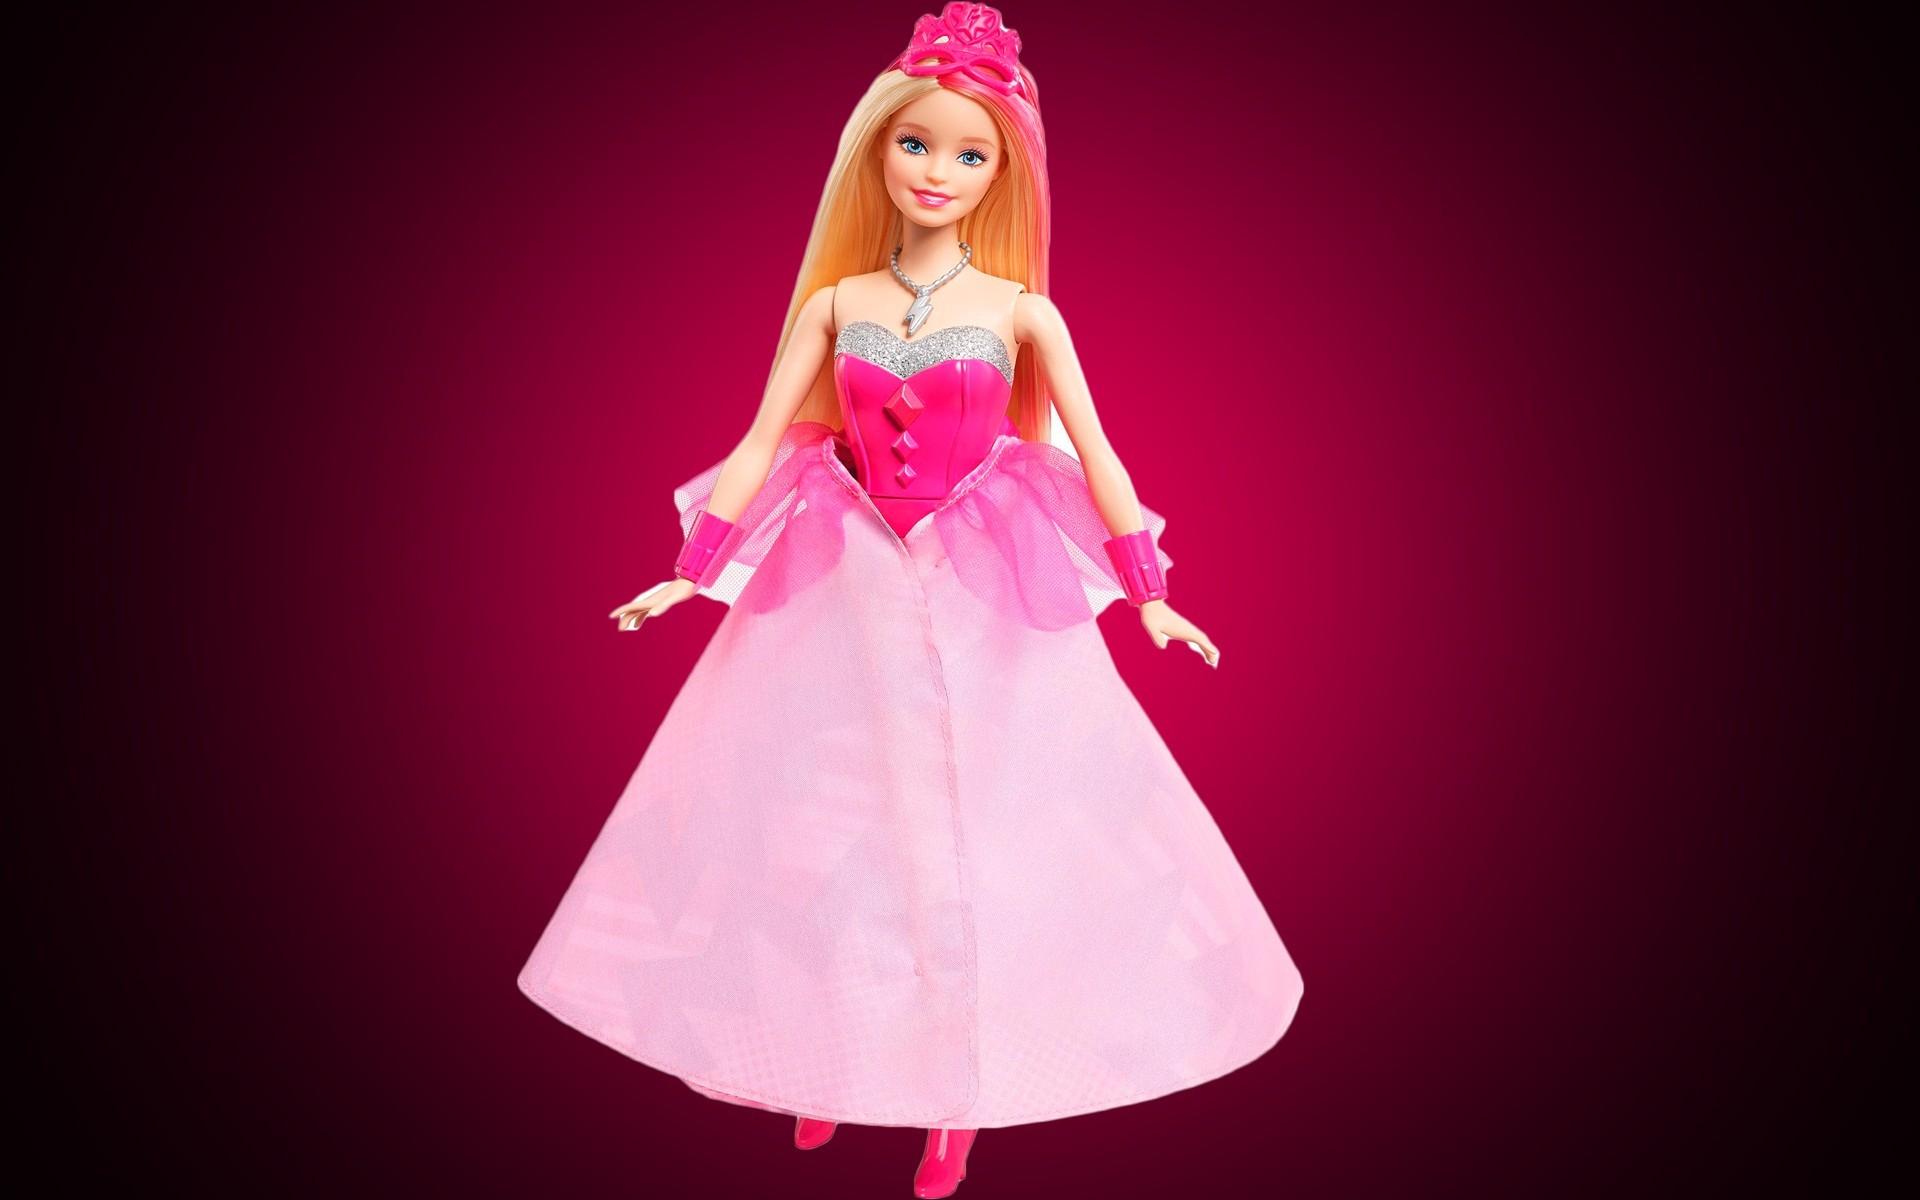 … sweet barbie doll pic